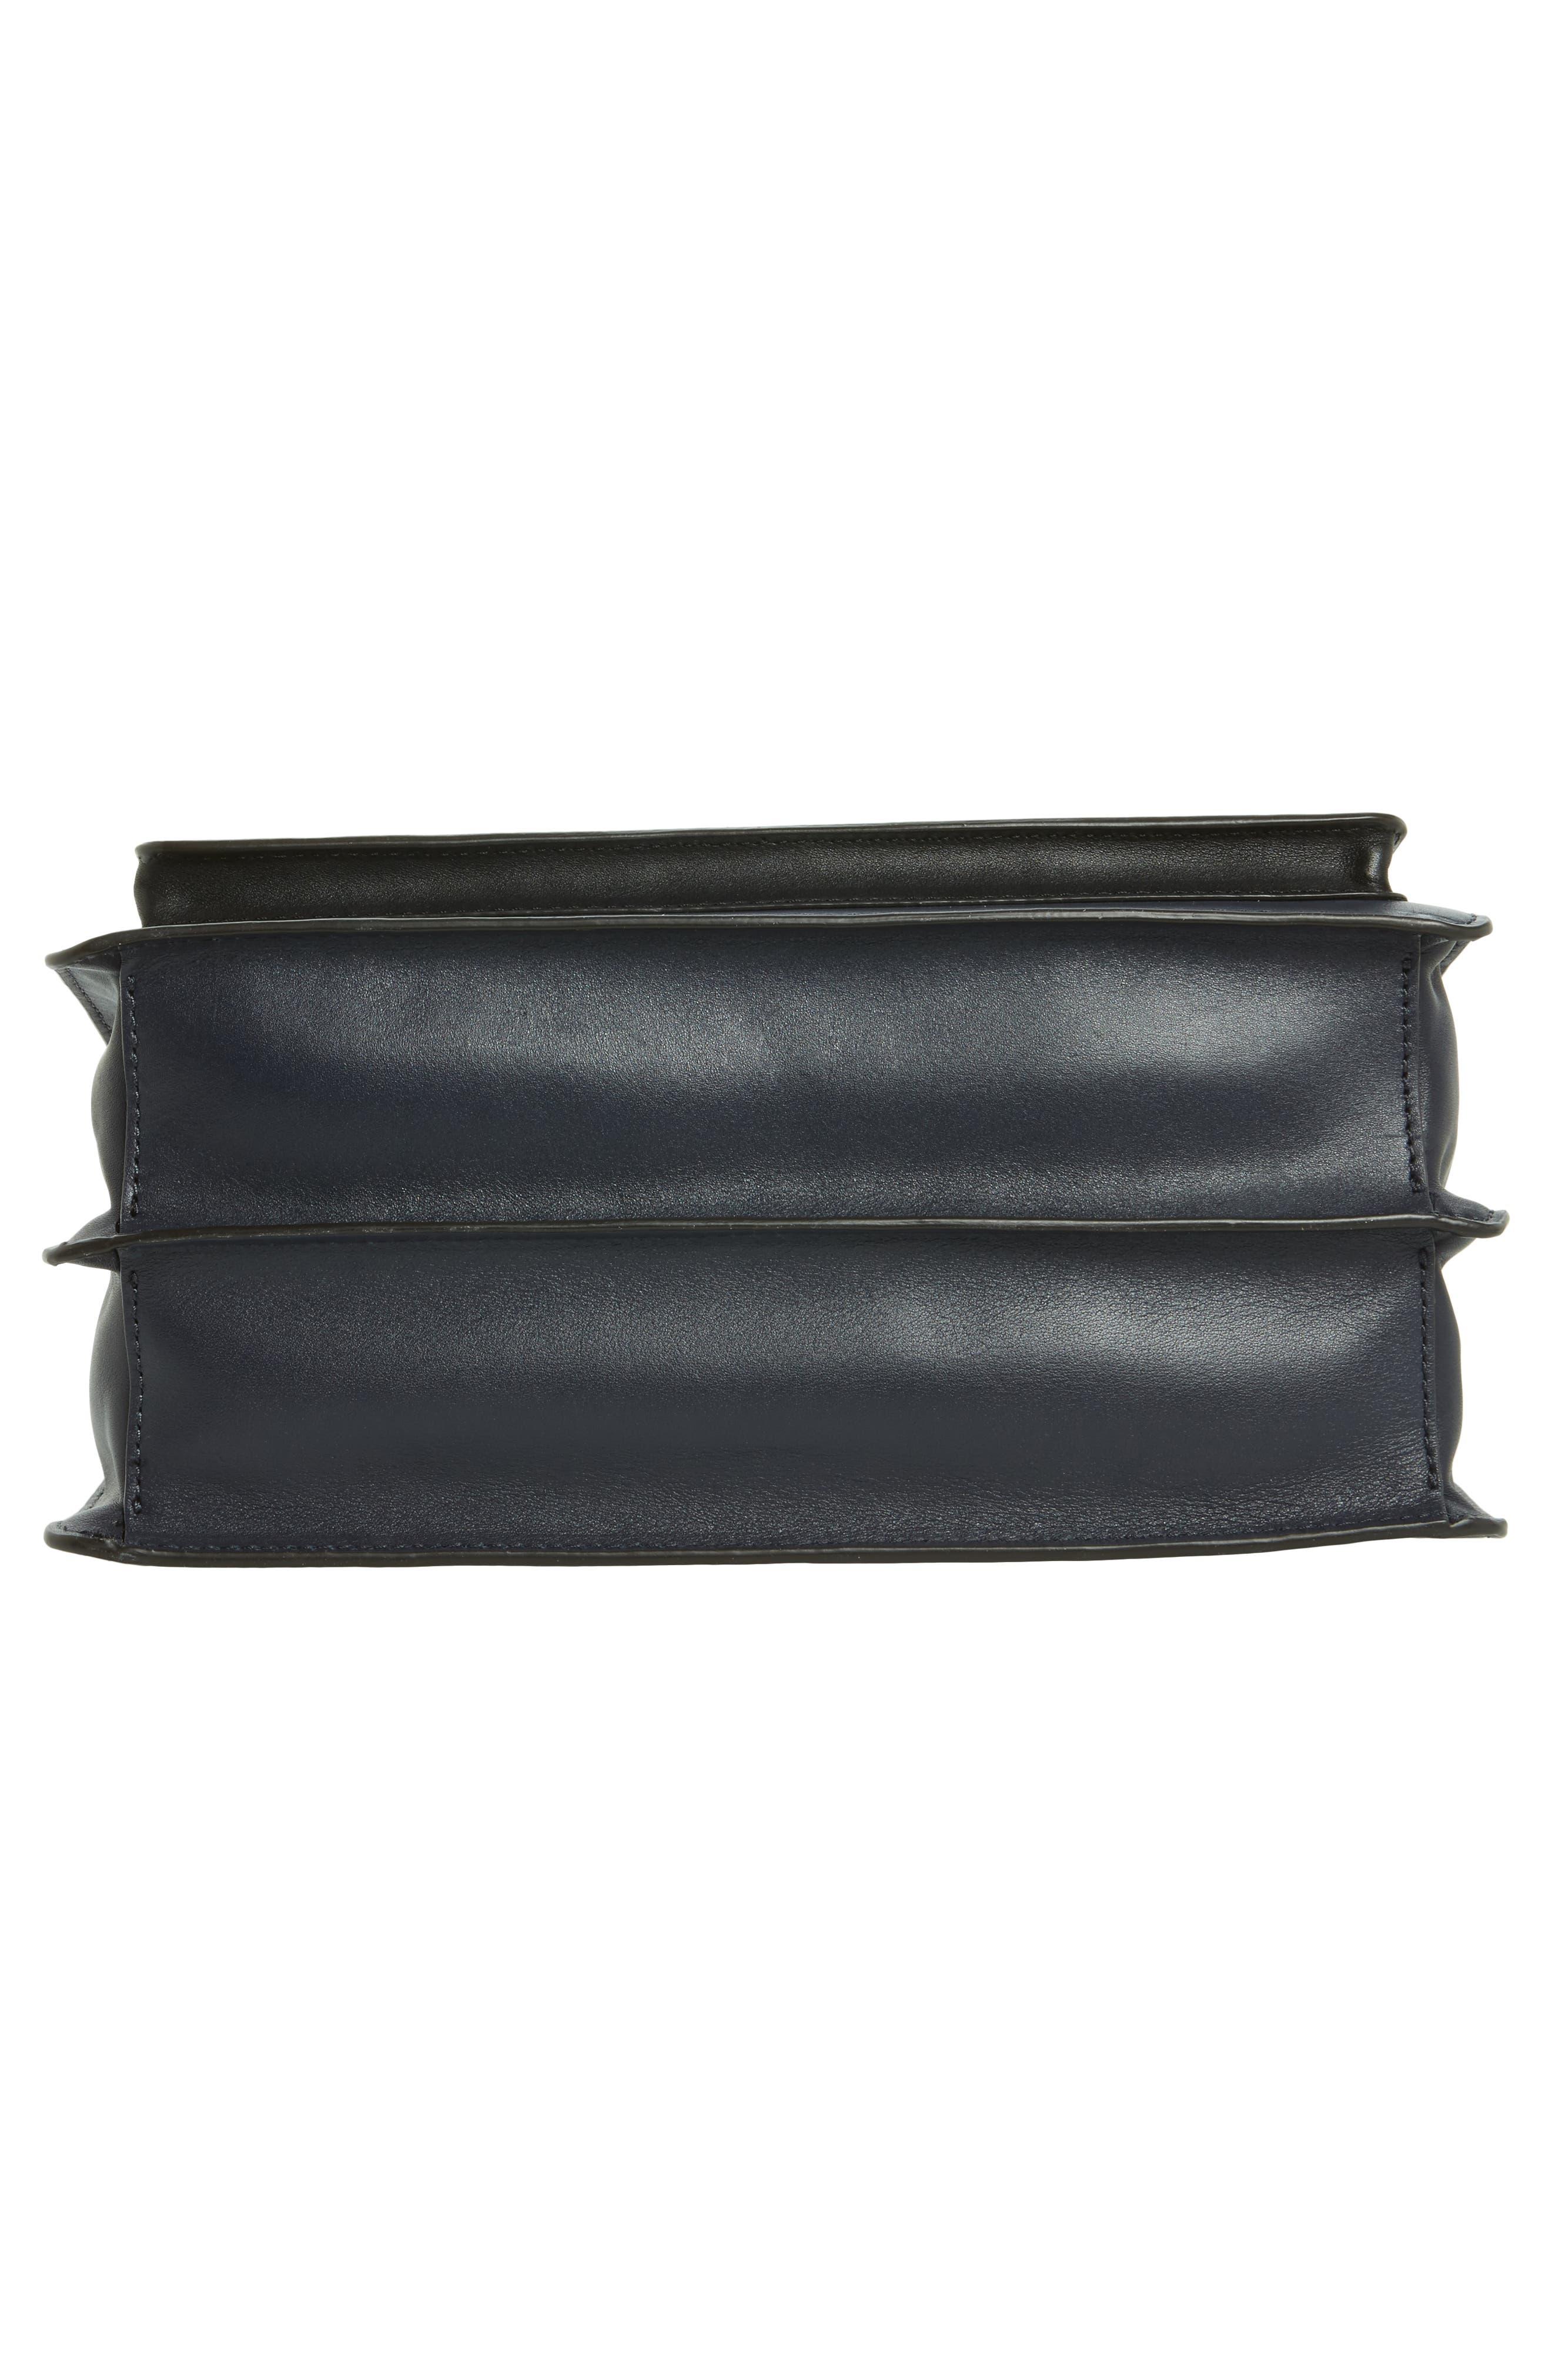 Top Handle Shoulder Bag,                             Alternate thumbnail 6, color,                             Black